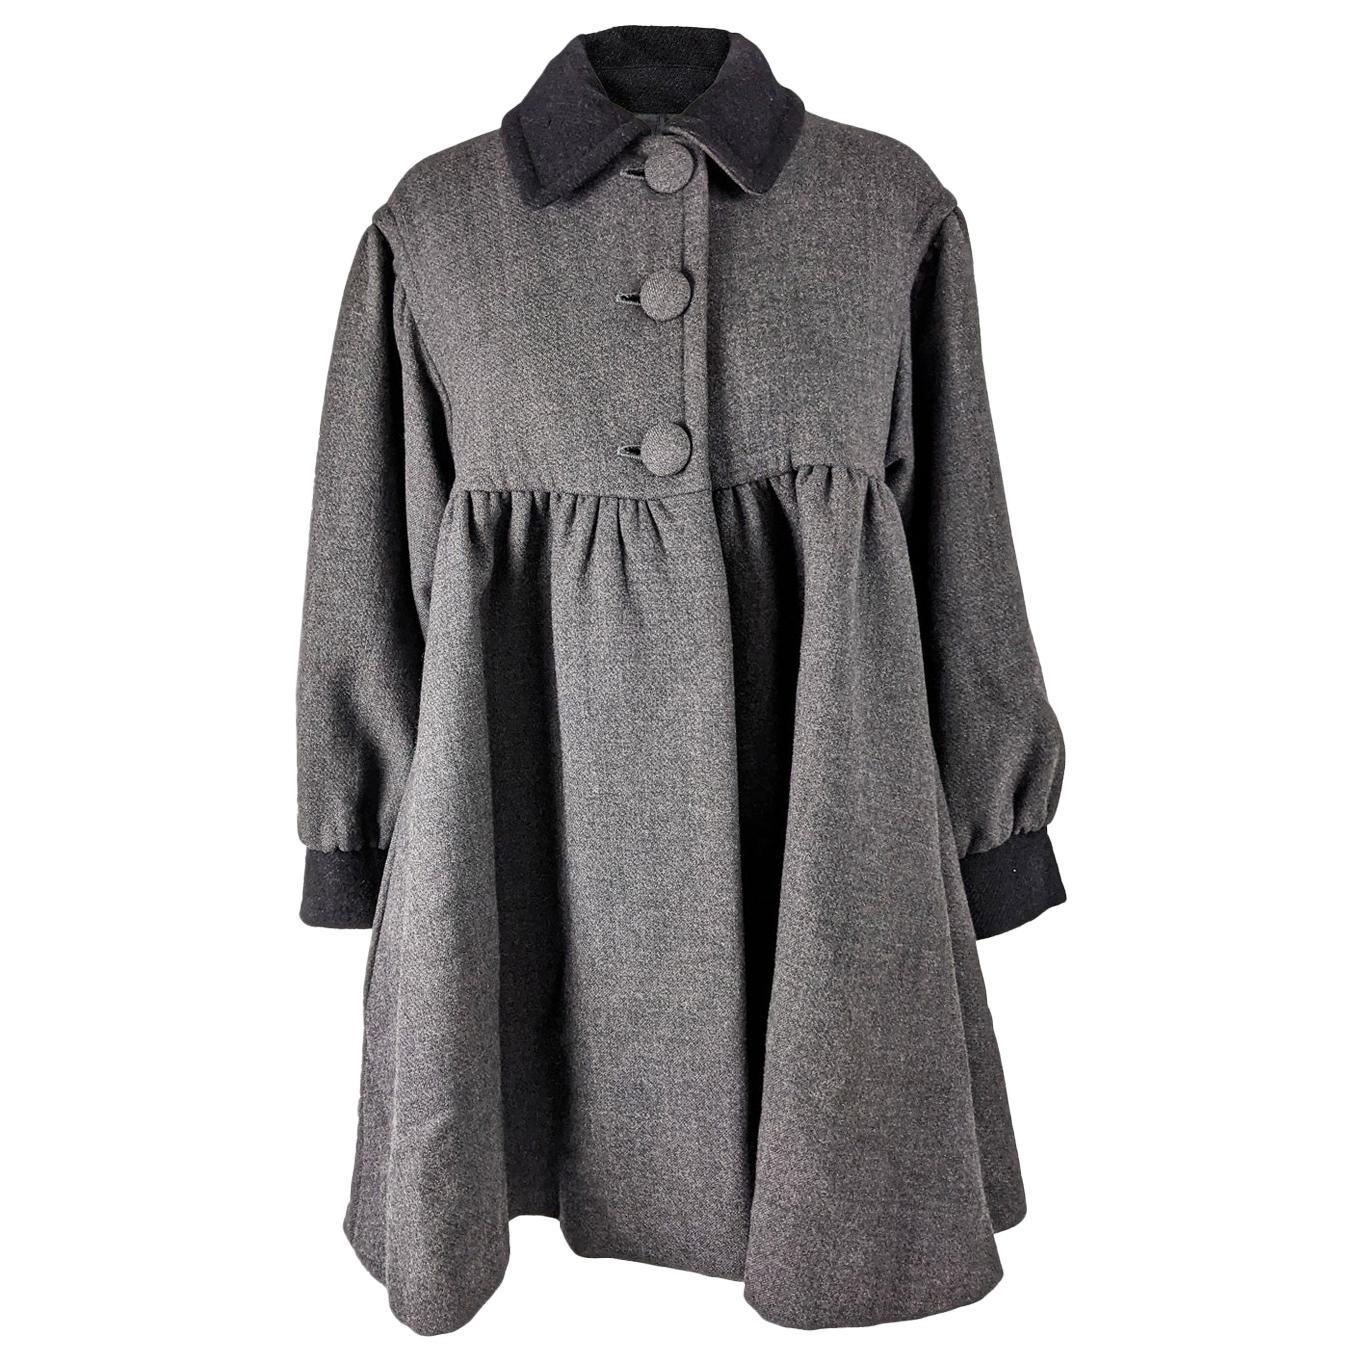 Moschino Vintage Wool Coat